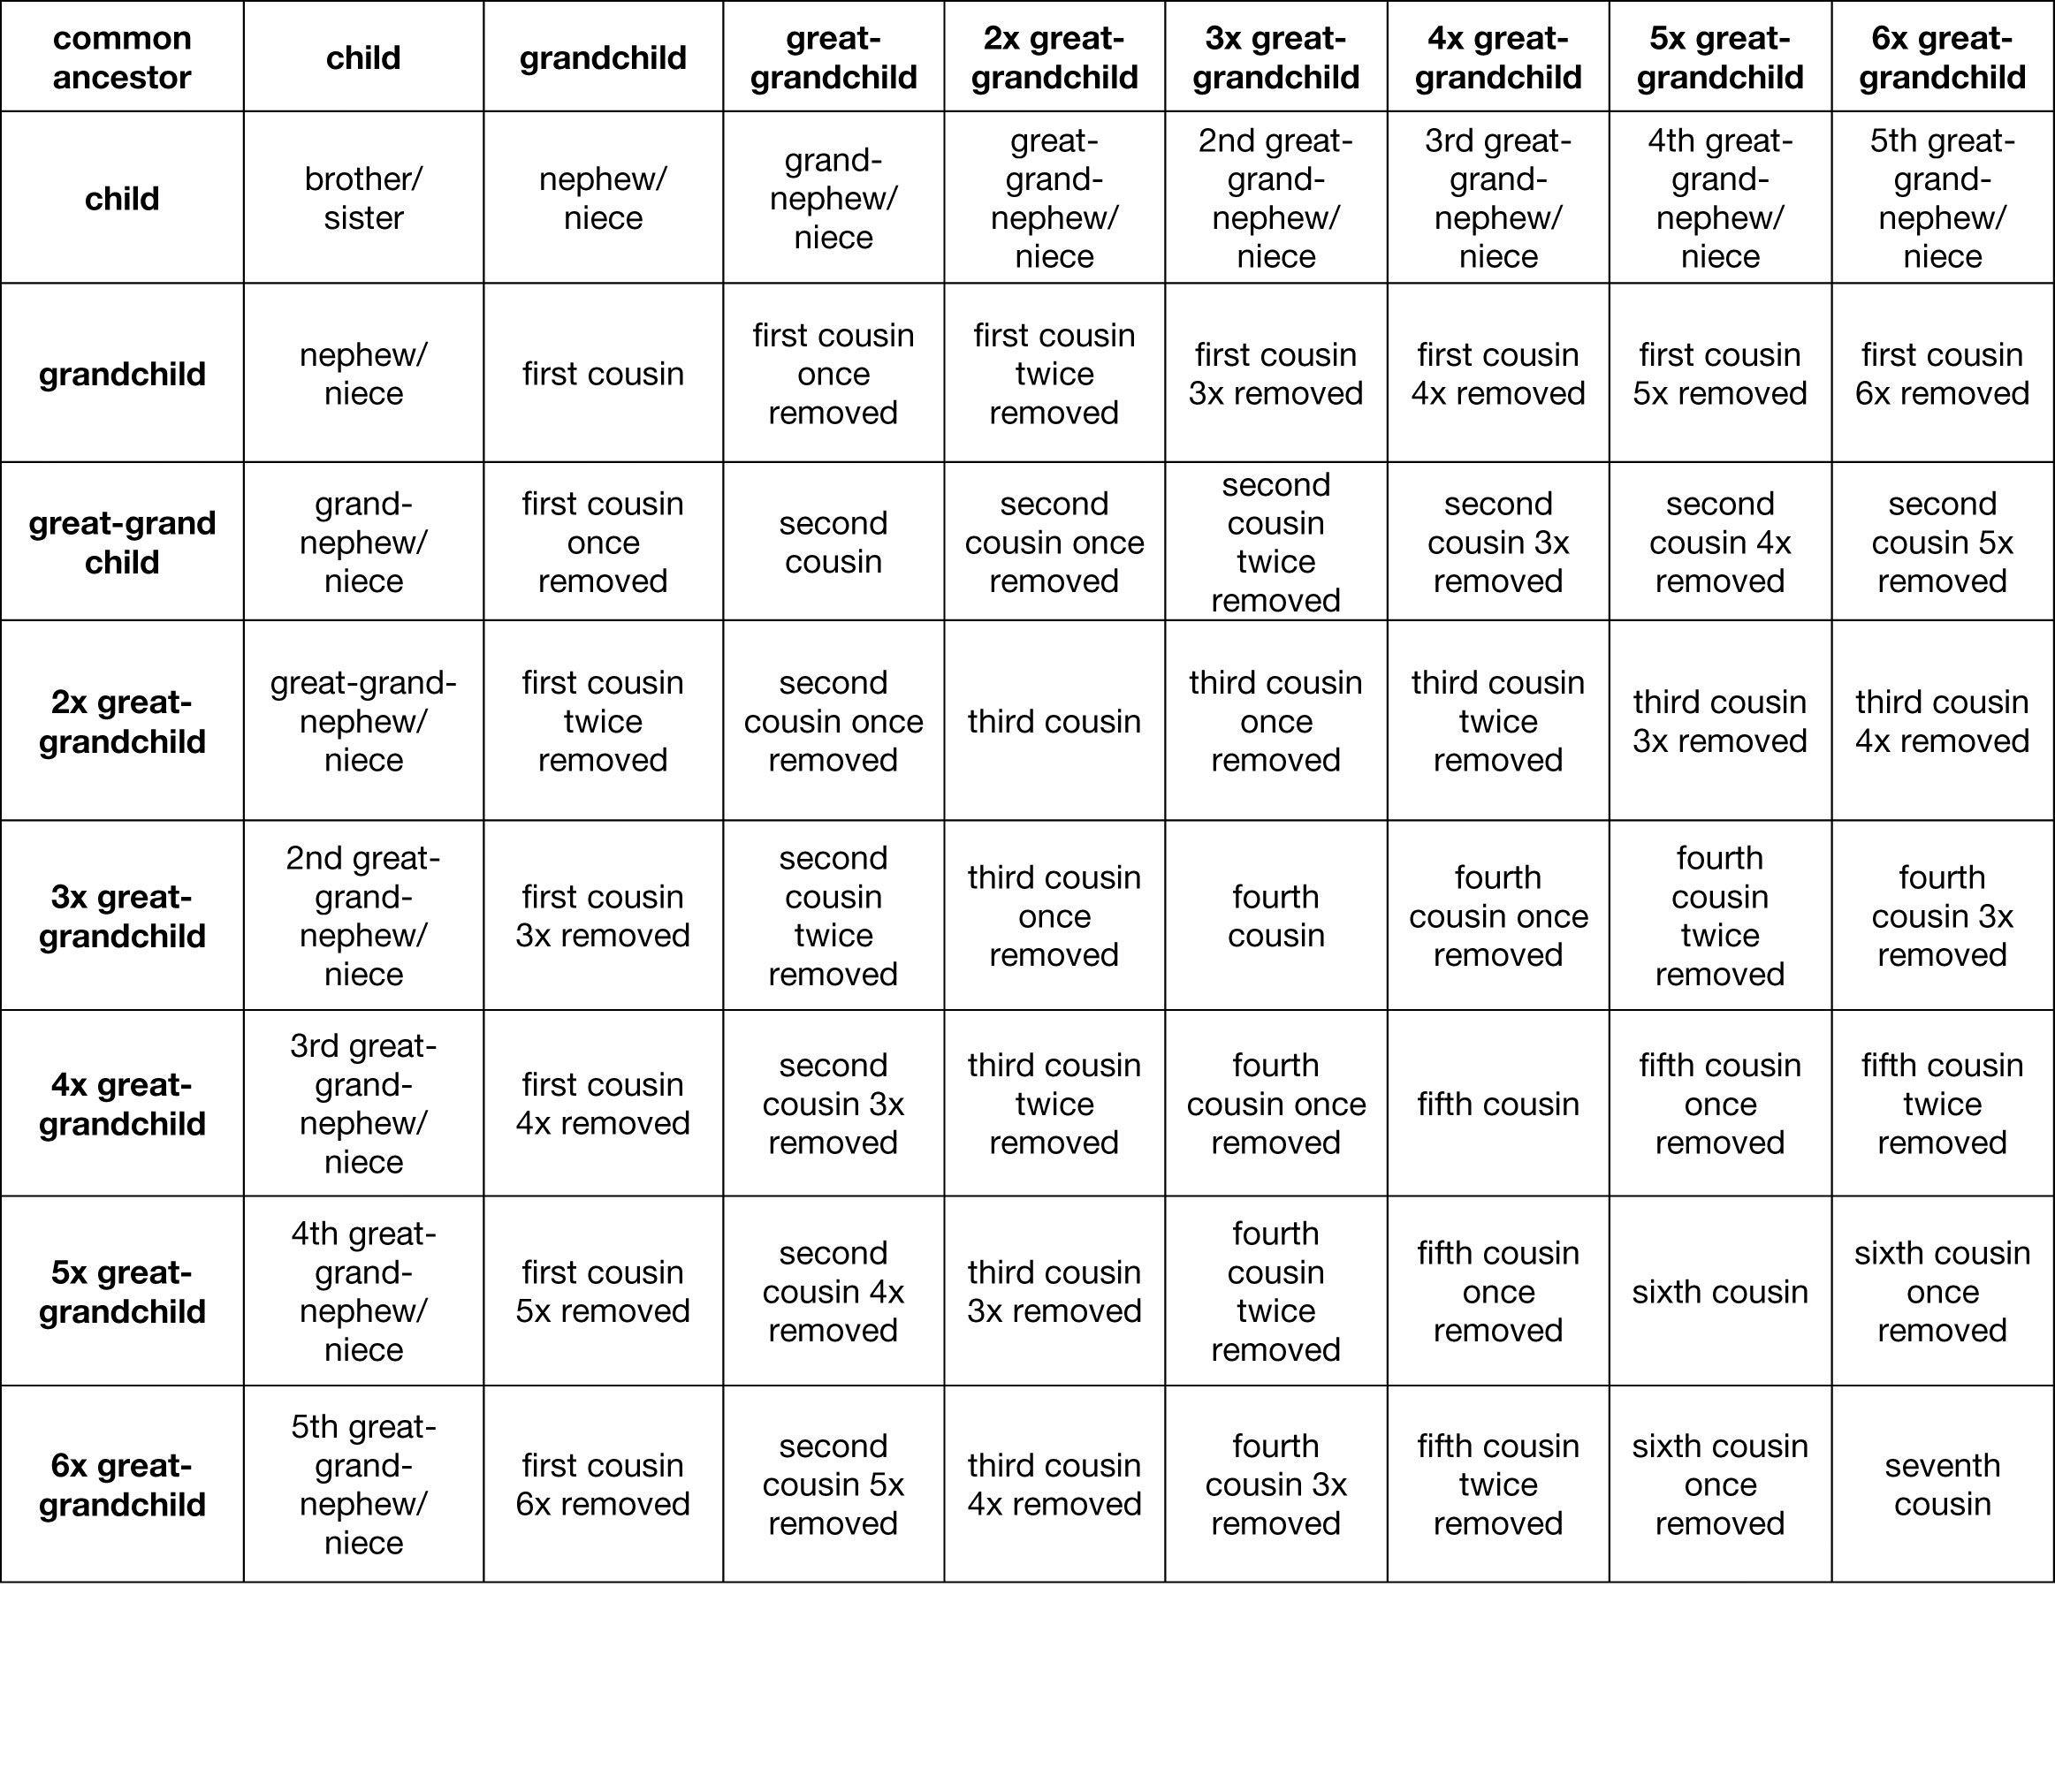 Family Relationship Chart Common Ancestor